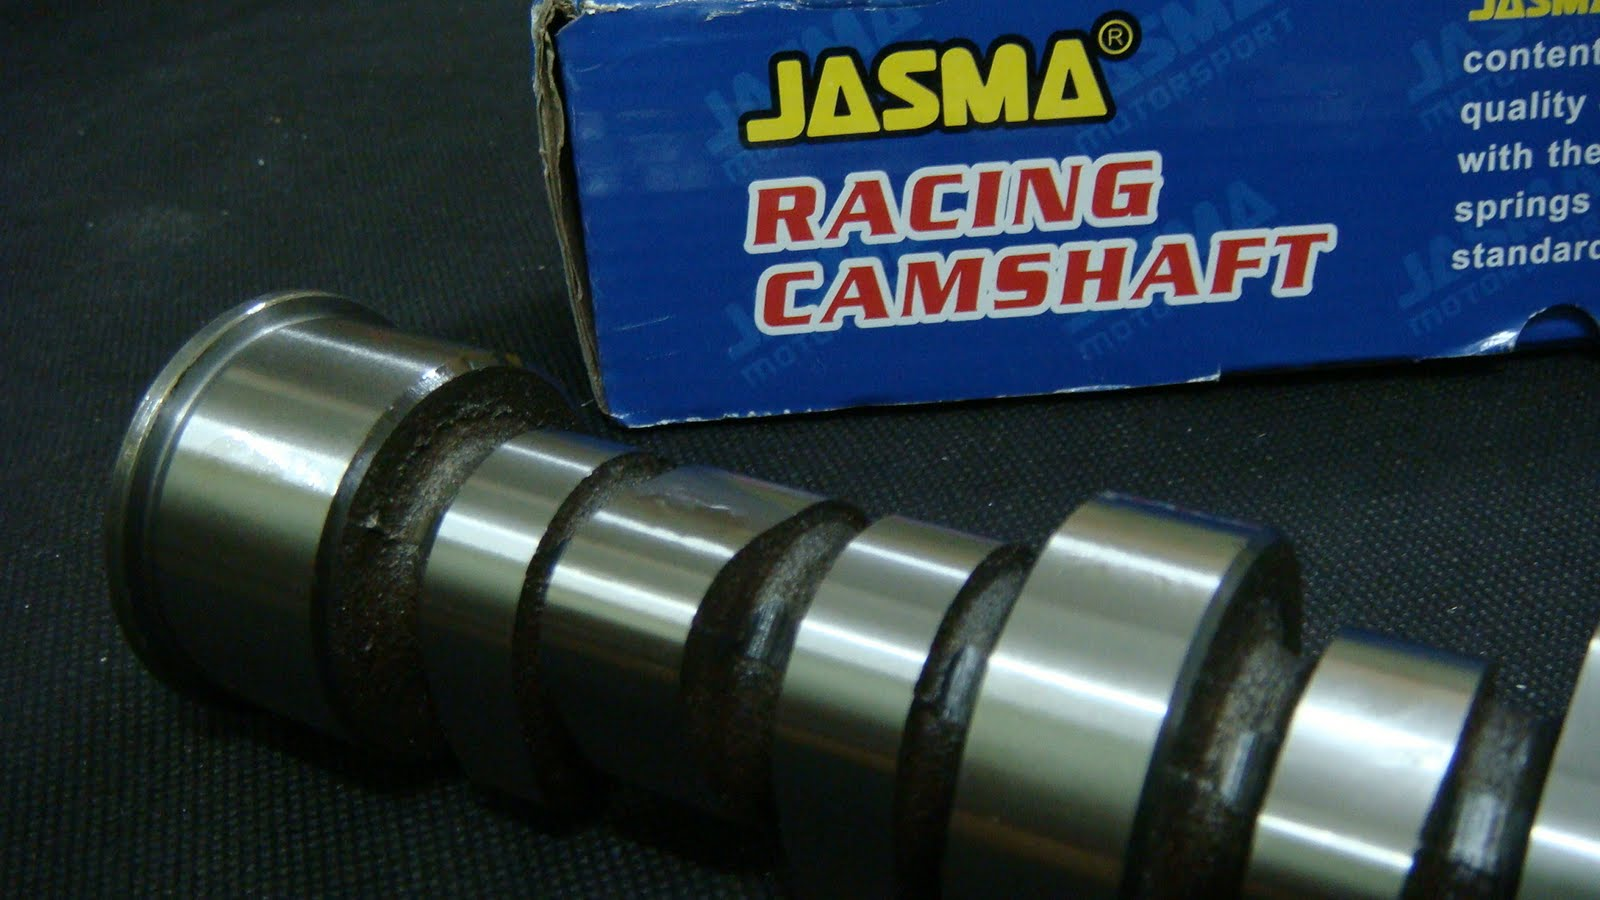 fungsi governor crankshaft camshaft intake manifold exhaust manifold spark plug glow plug flywheel